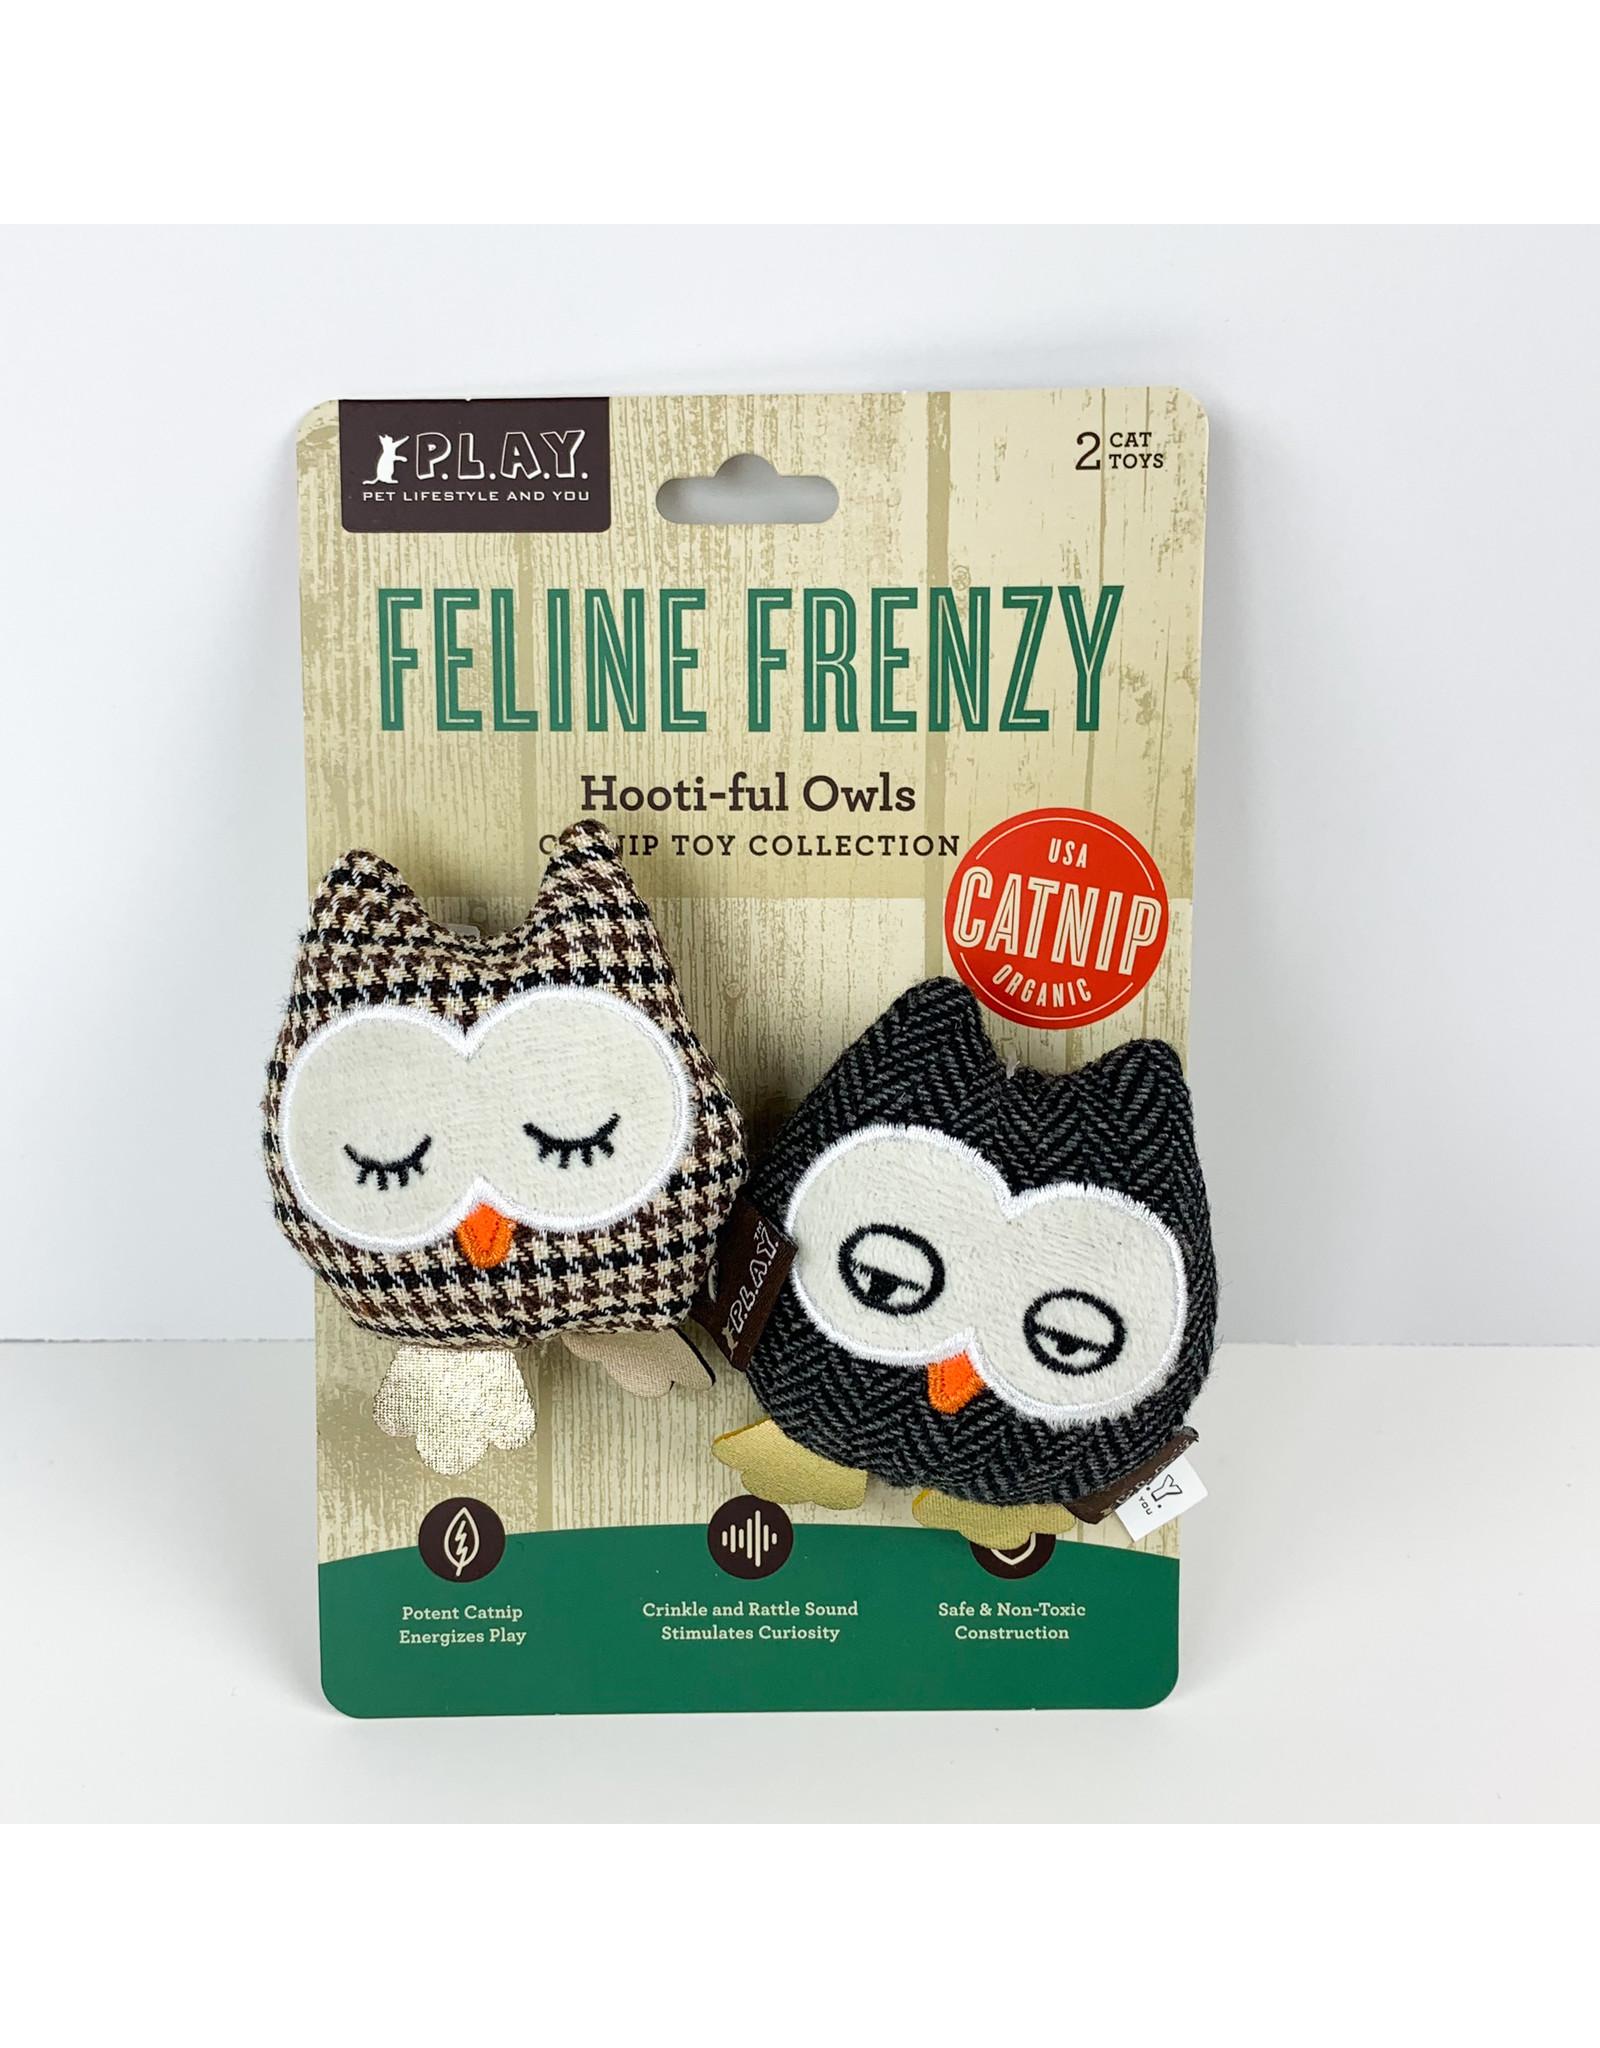 Pet Play Feline Frenzy Hootiful Owls